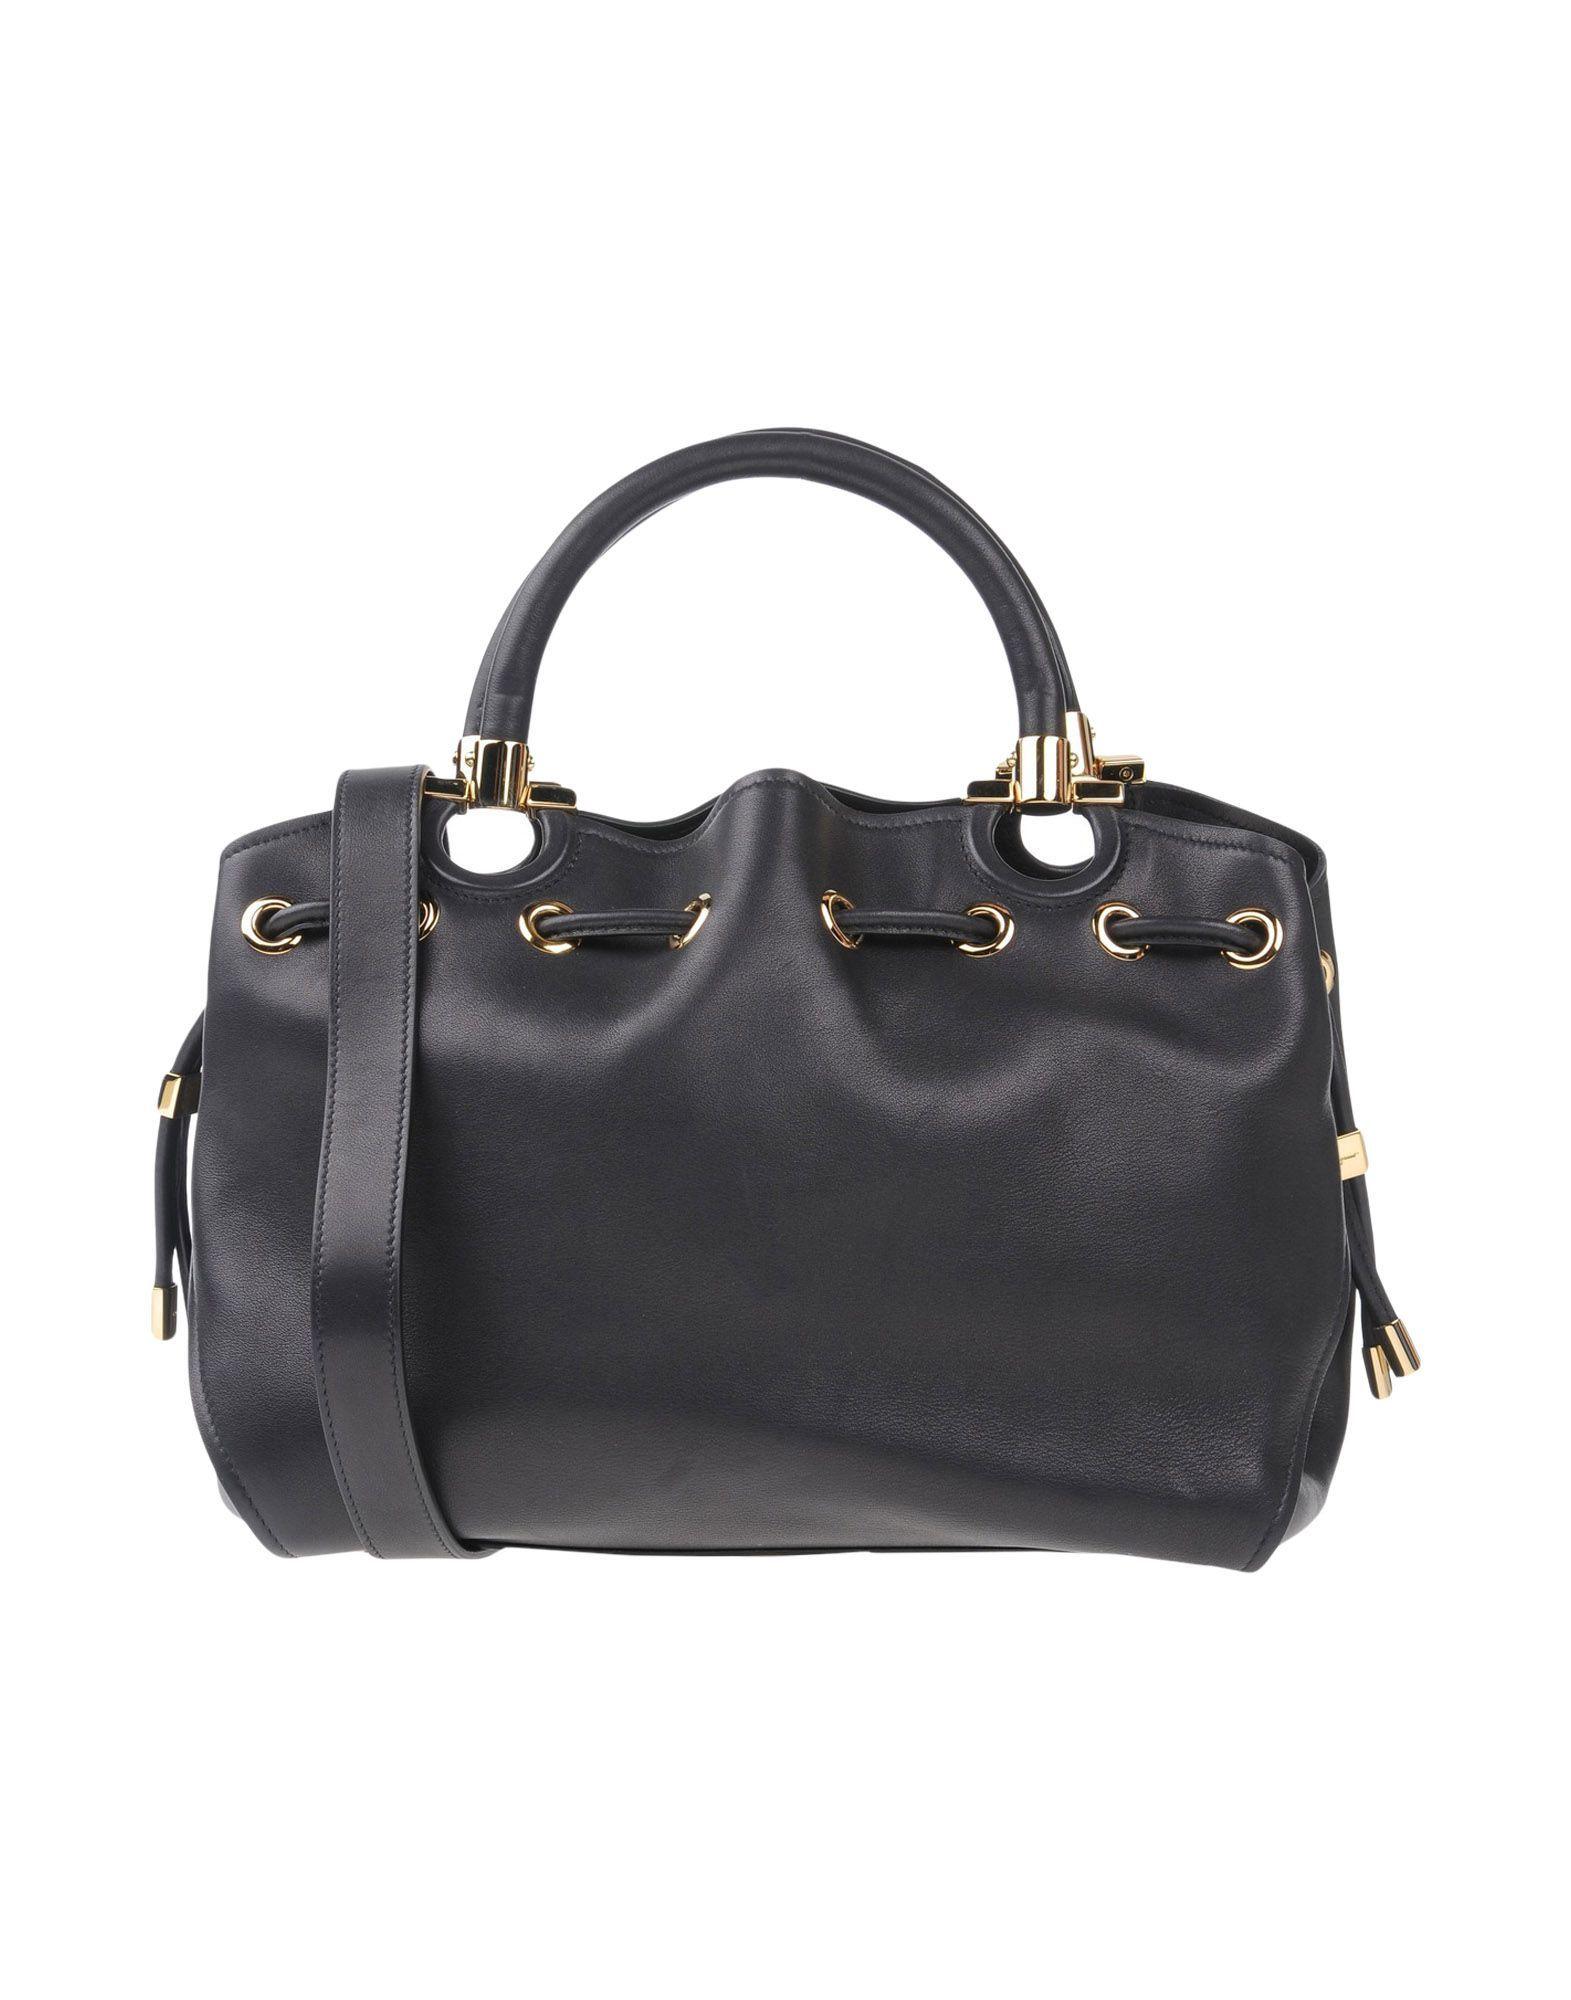 Salvatore ferragamo bags shoulder bags hand jpg 1571x2000 Salvatore  ferragamo black handbags 0c59326afd2ab